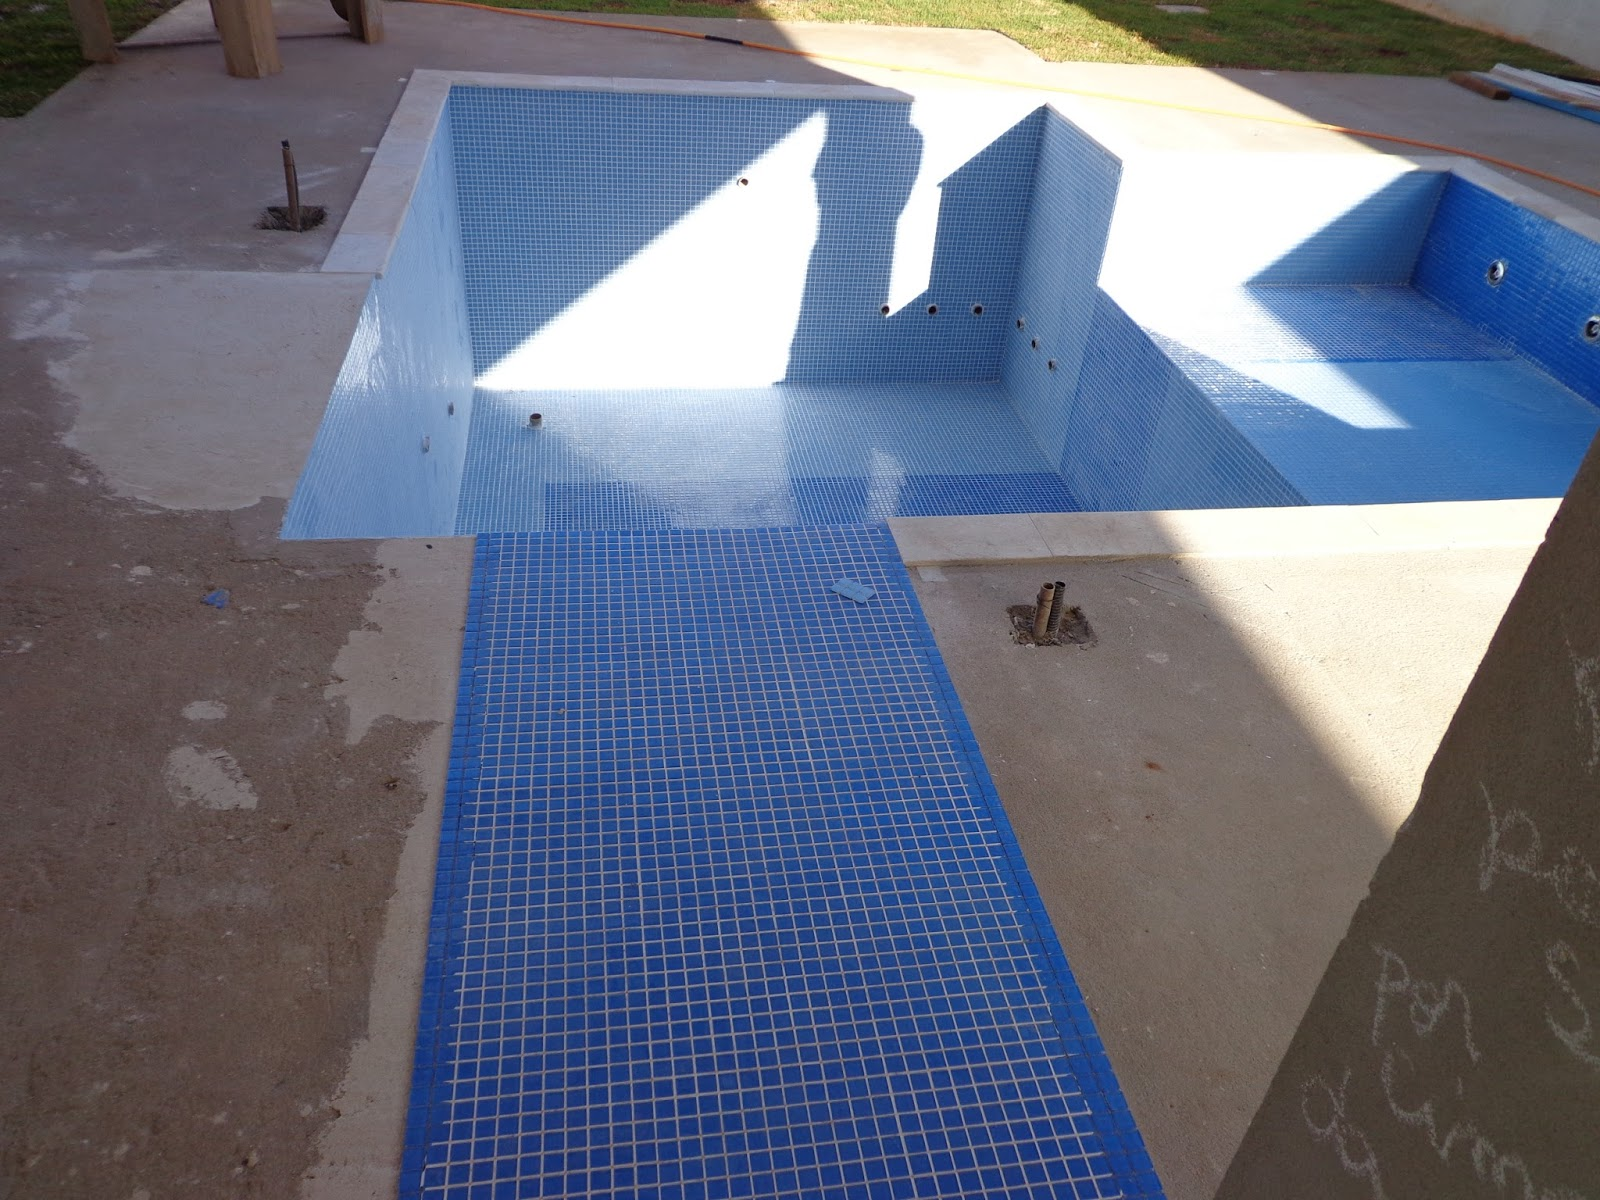 Casa constru o 70a e 71a semana piscina e jardim e for A tua piscina ta cheia de ratos